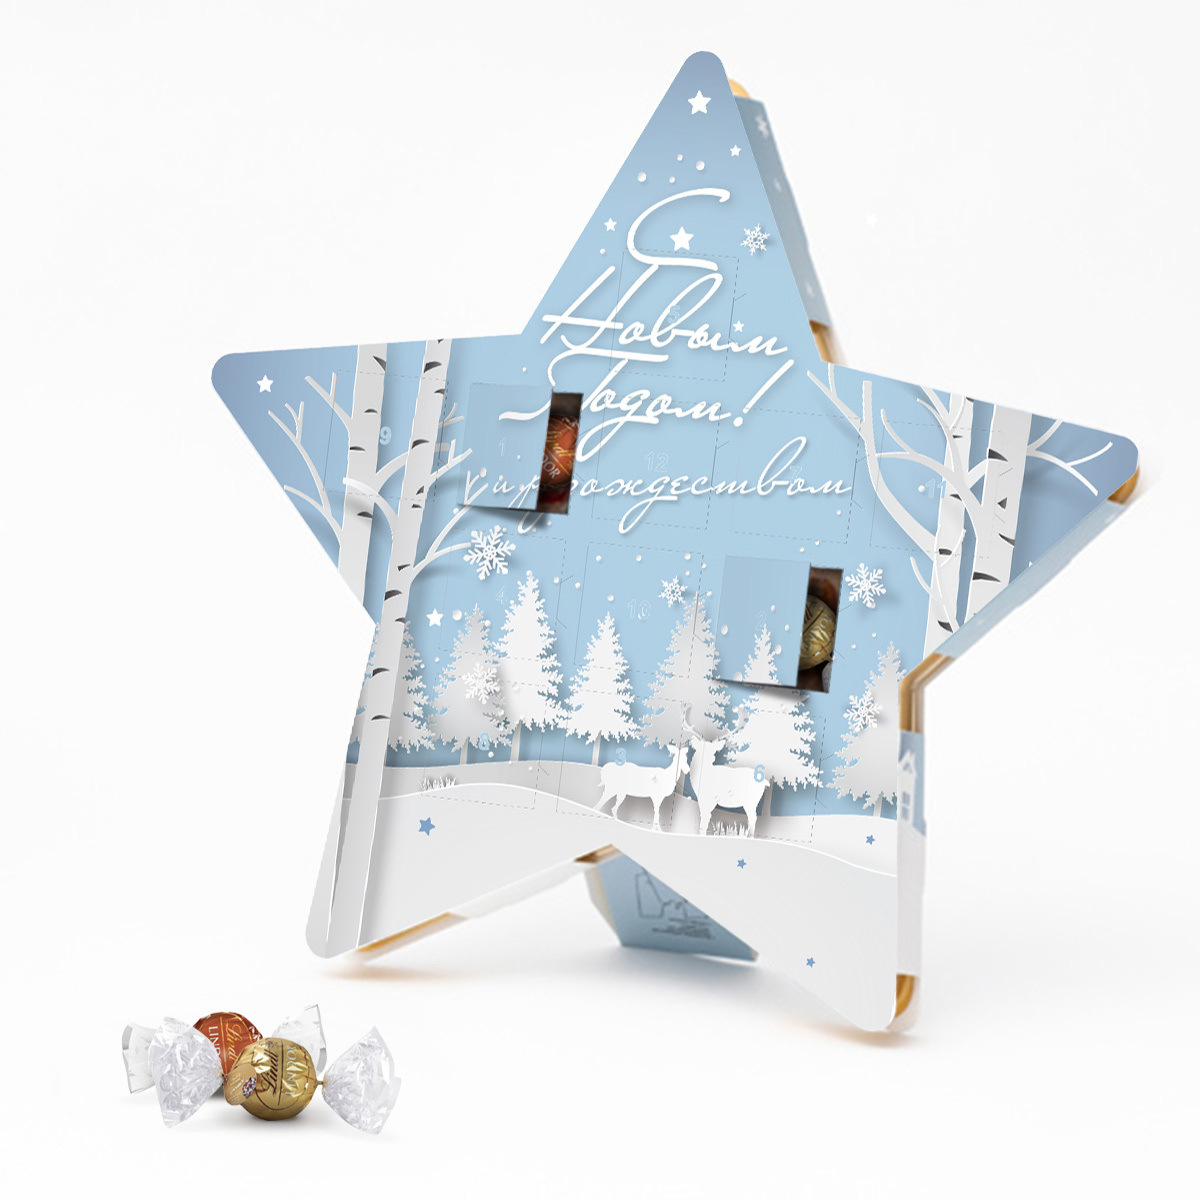 Адвент календарь-звезда с окошками с конфетами и логотипом